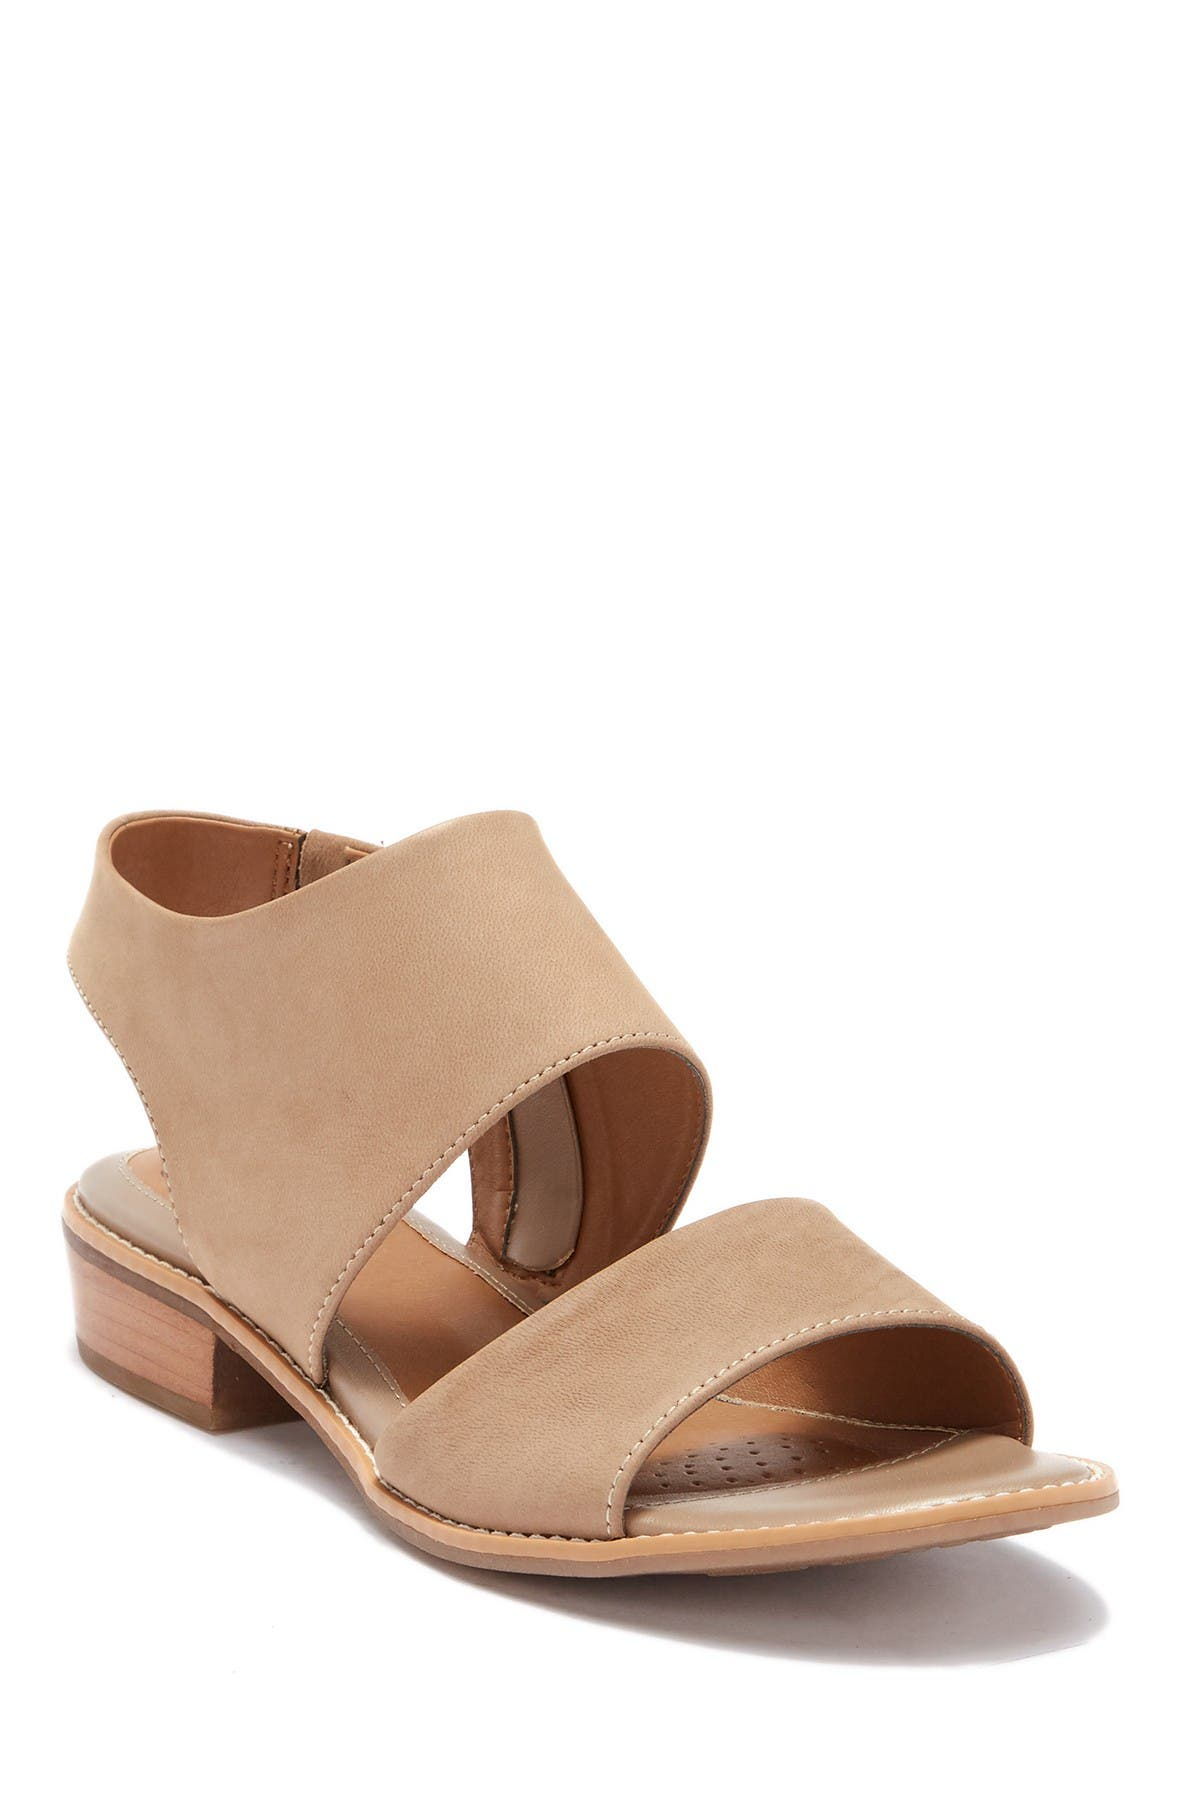 Image of Sofft Nitara Slingback Strap Sandal